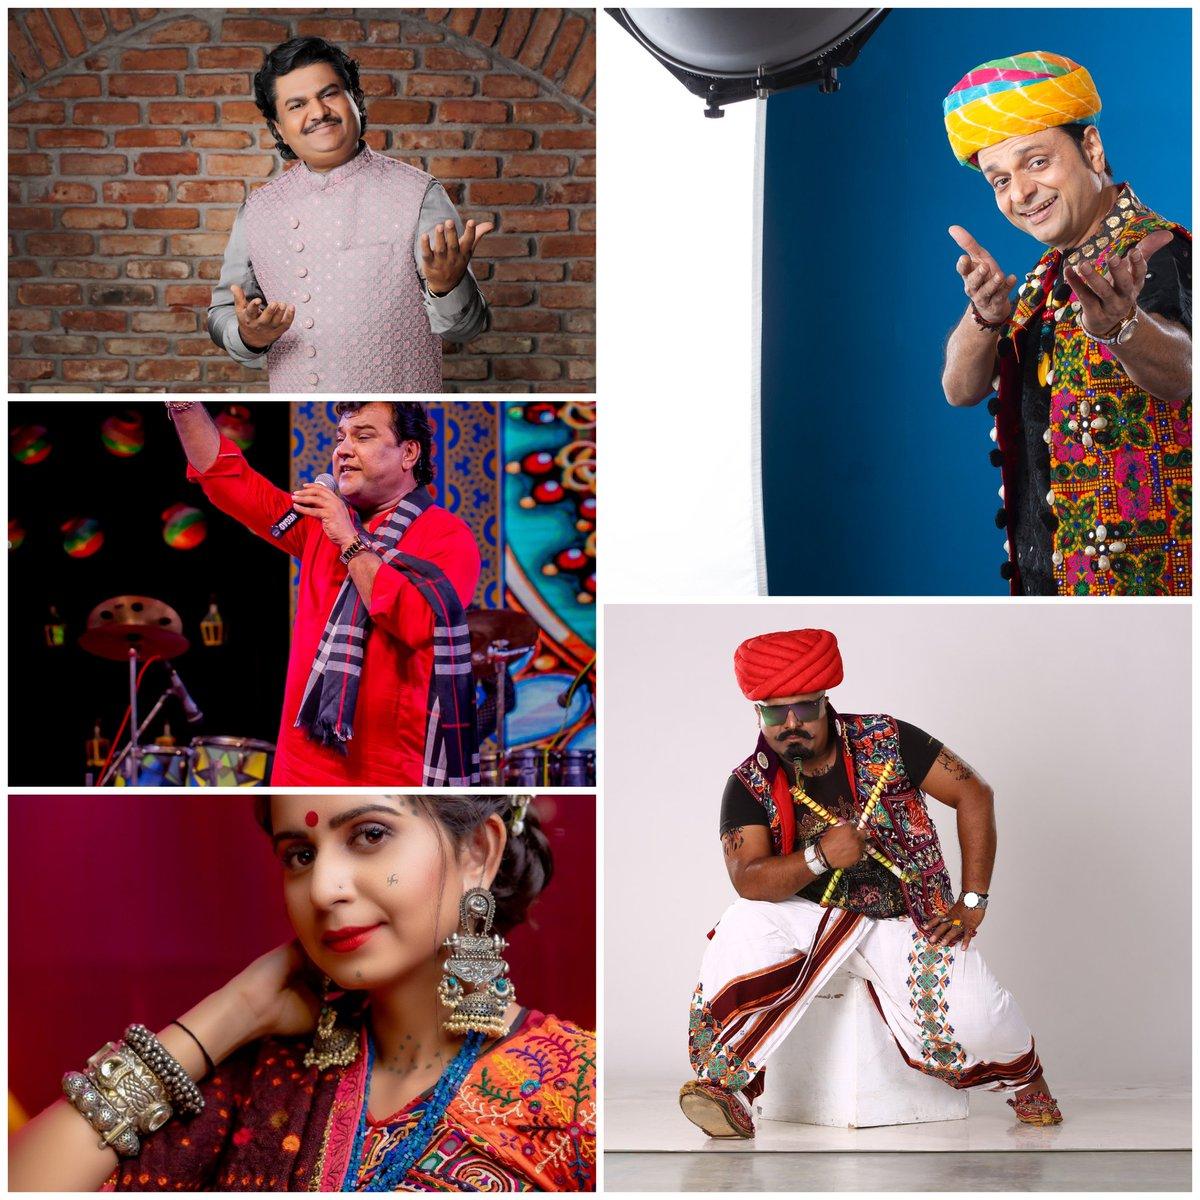 Reliance Jio announces Jio Digital Navratri; ropes in top Gujarati singers